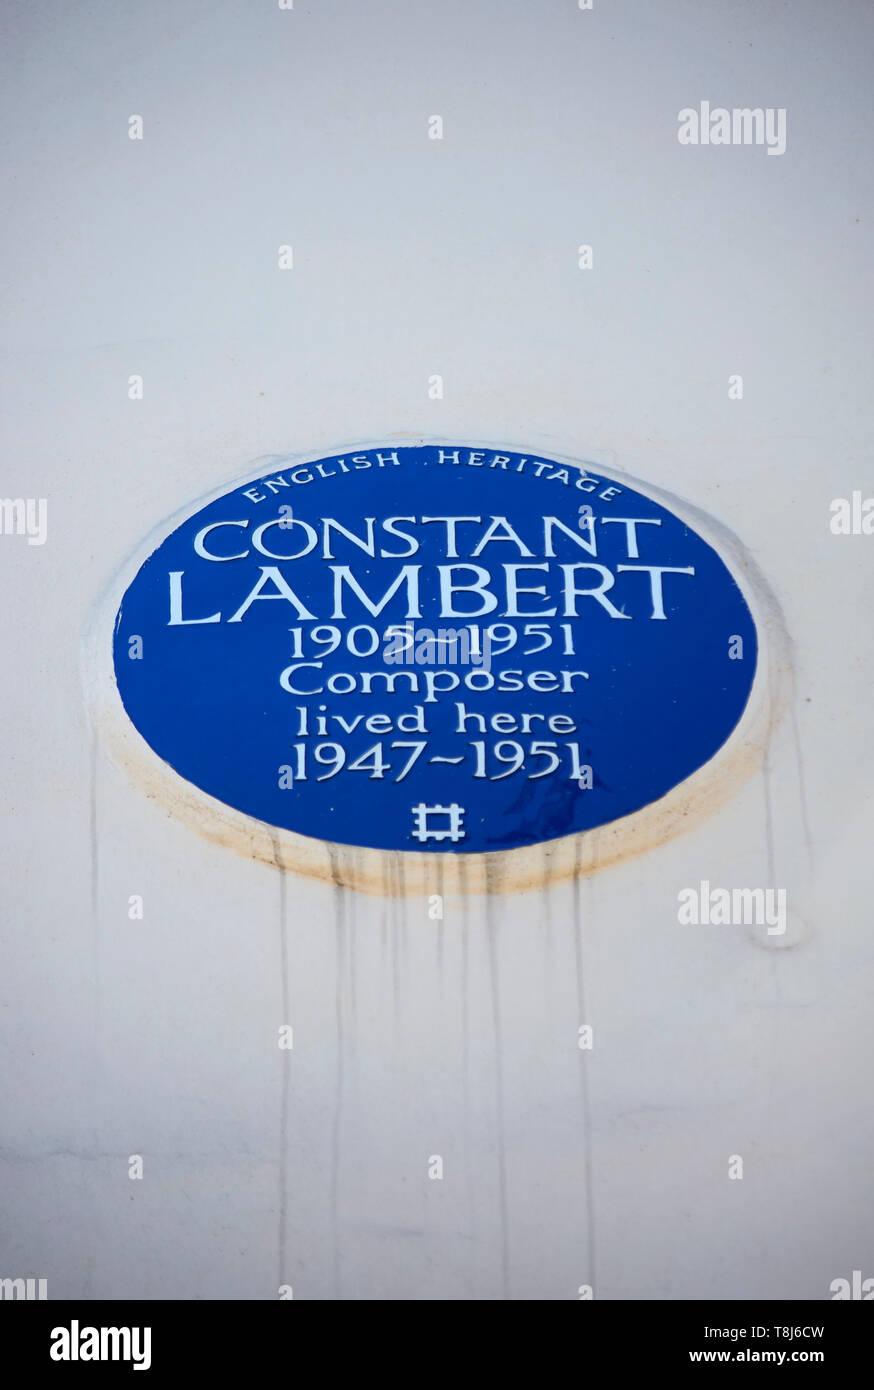 English Heritage placa azul marcando un hogar del compositor constante lambert, Camden, Londres, Inglaterra Foto de stock